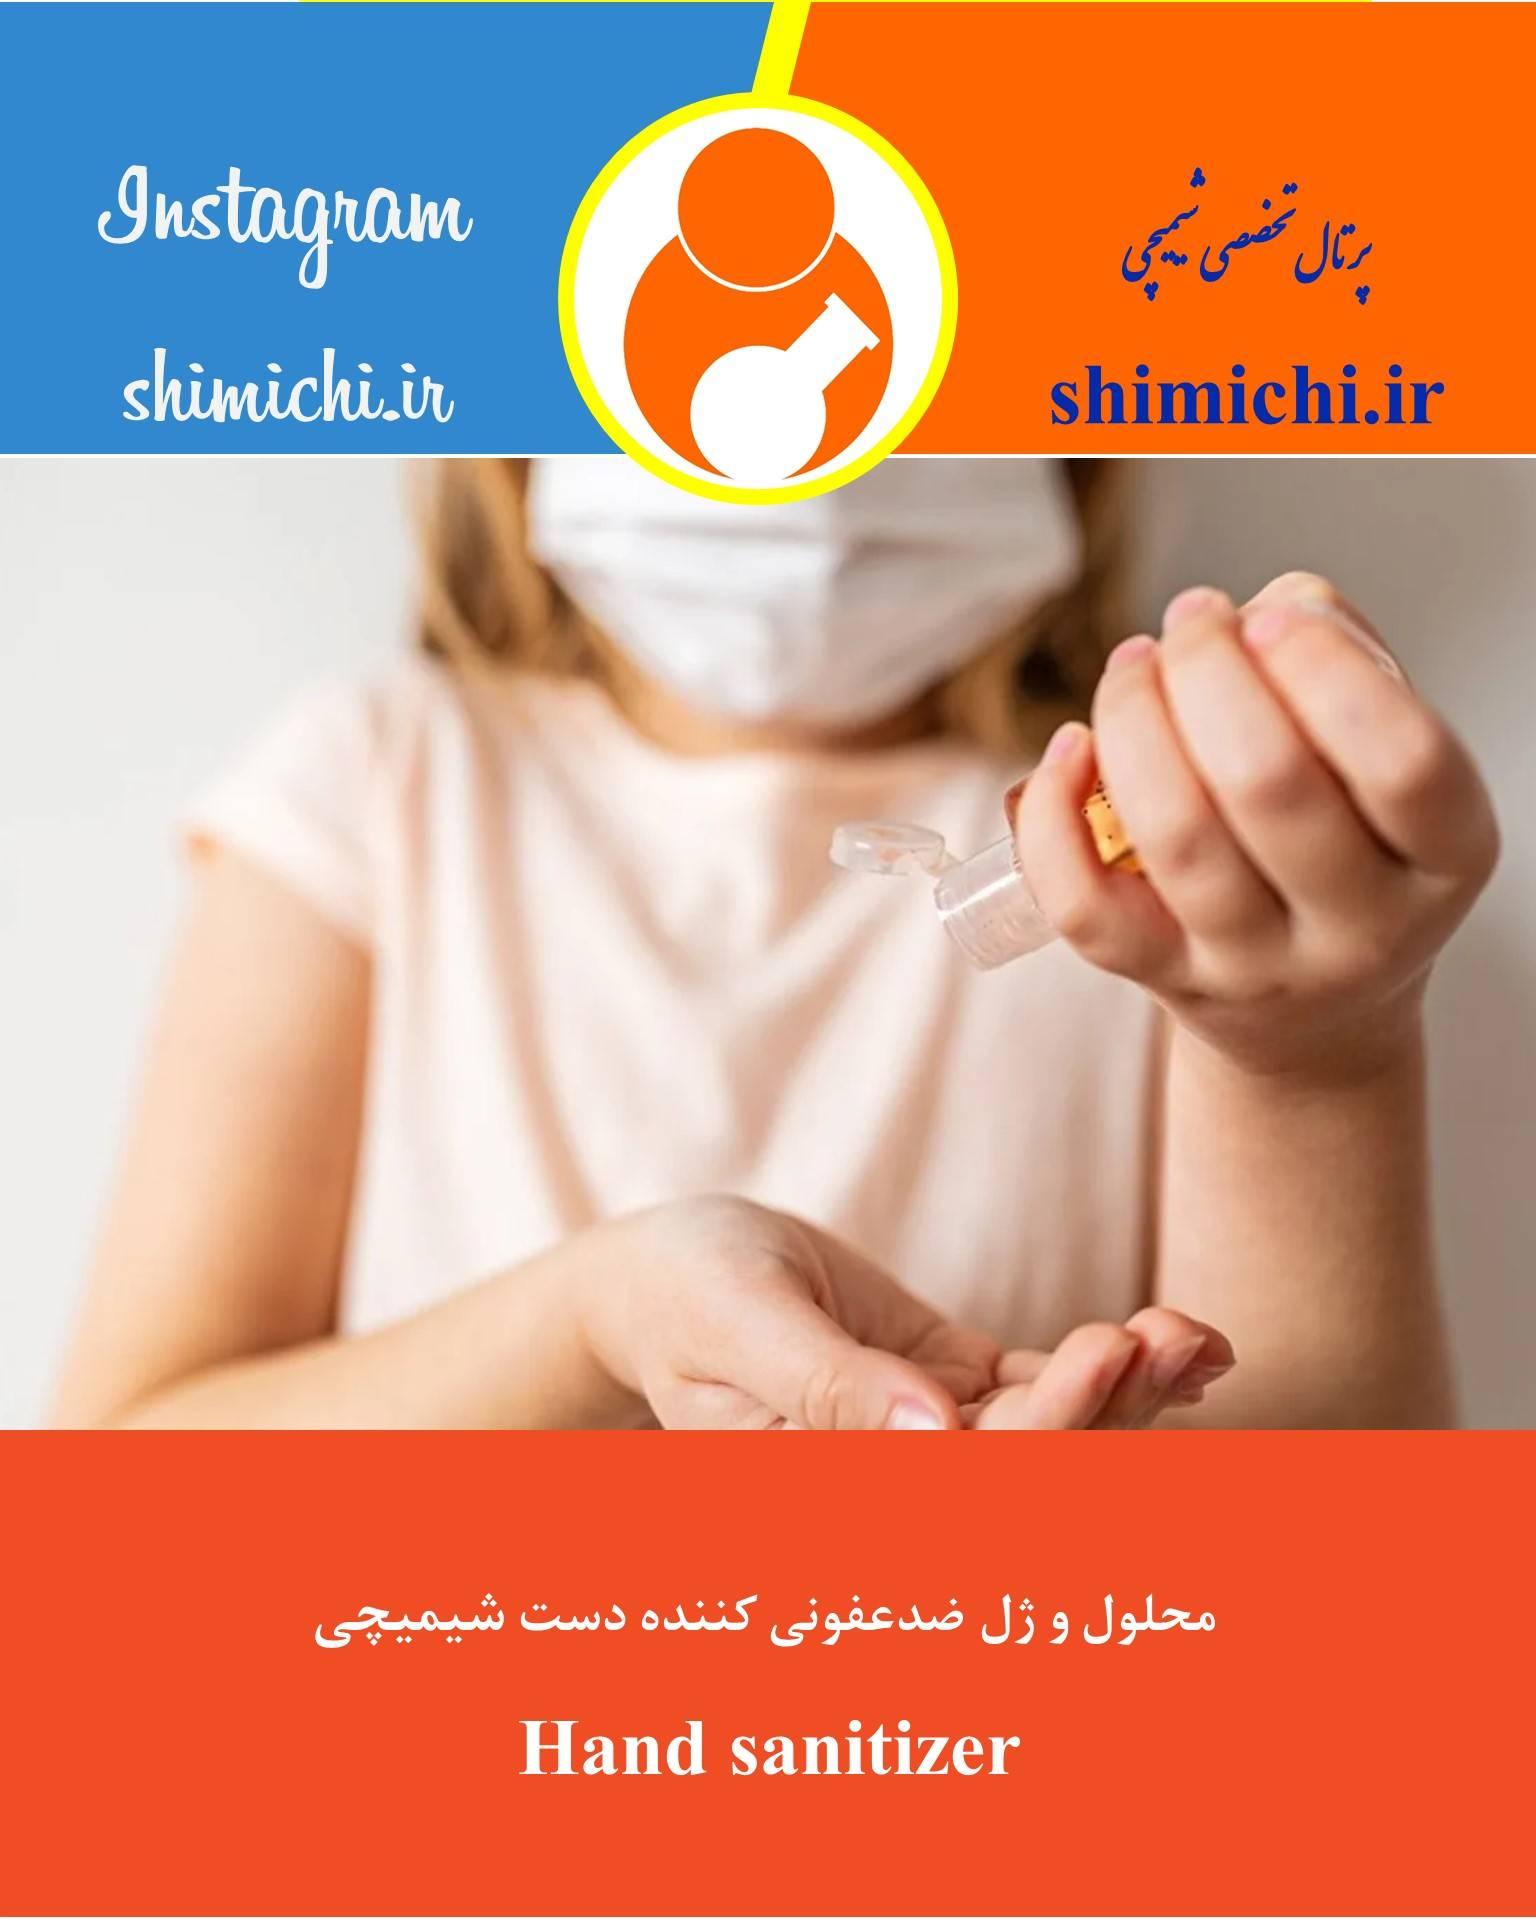 Hand-sanitizer ضدعفونی کننده های دست، جایگزین مایع دستشویی